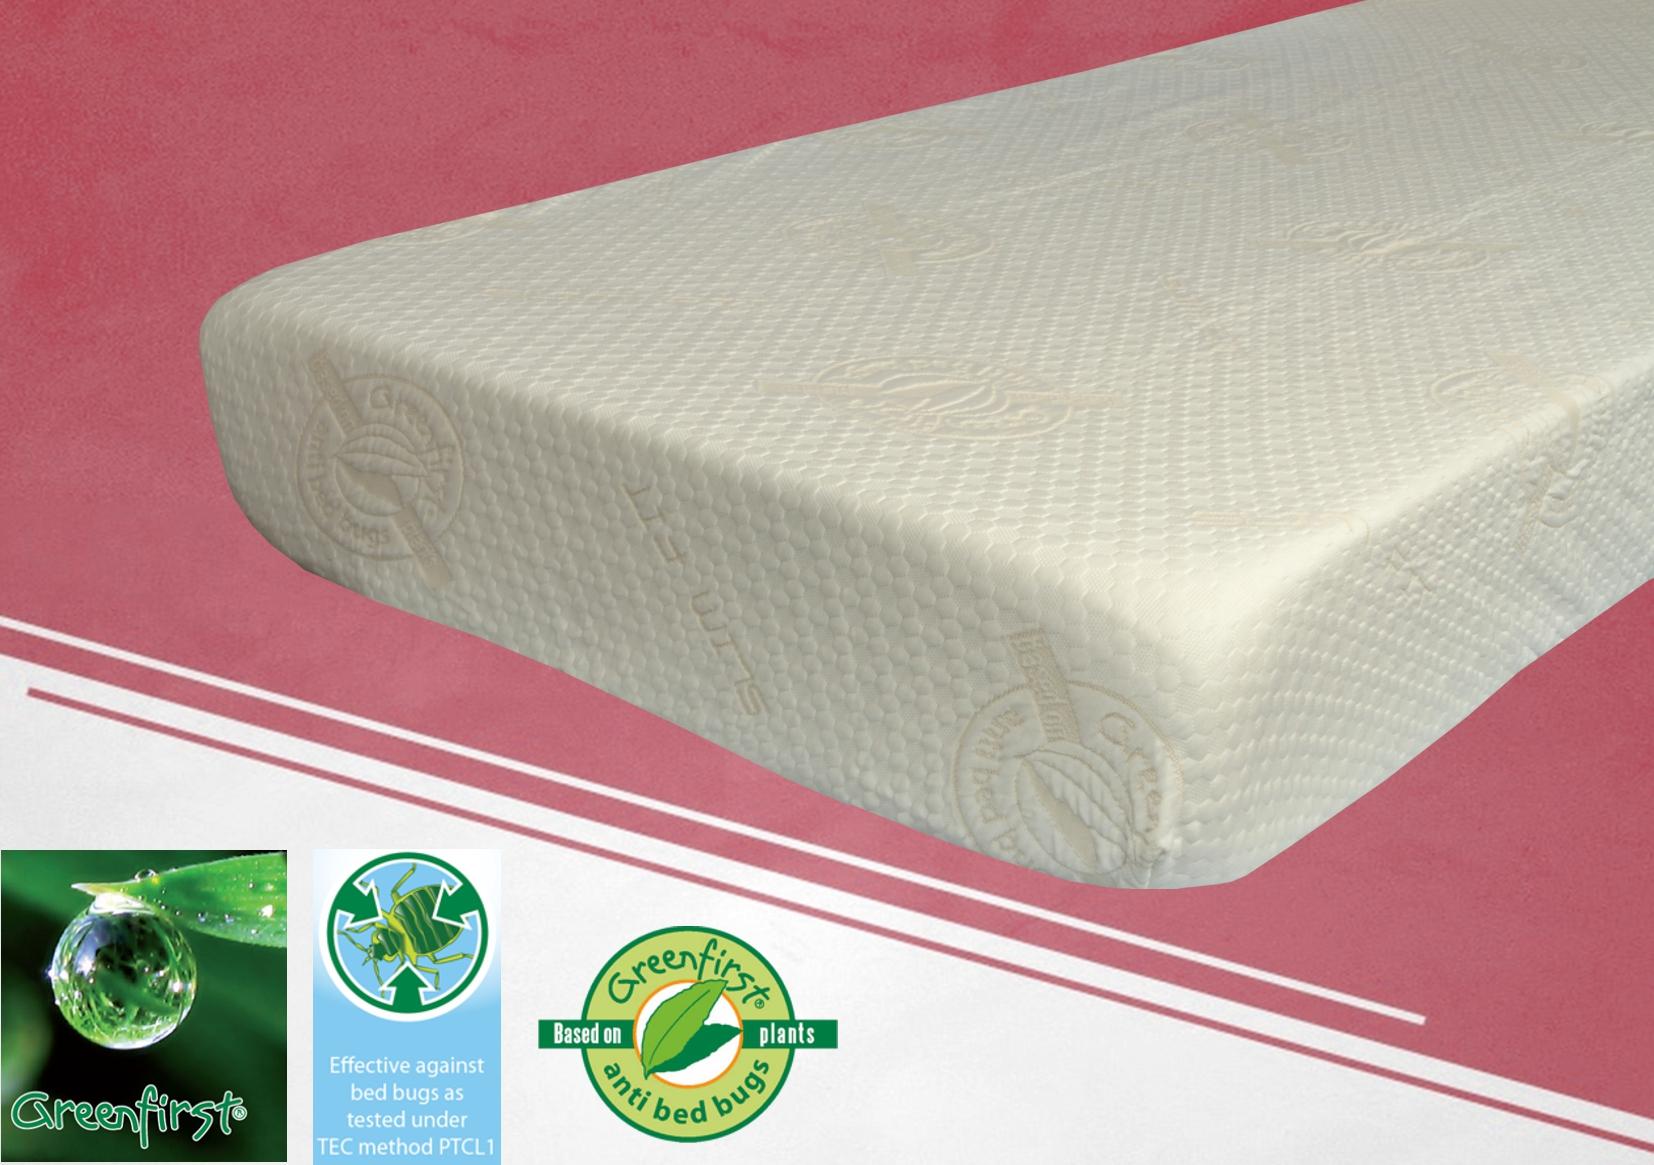 Heimtextil Exhibitors Products Il Guanciale Di Somma G Amp C Snc Personal Pillow Memory